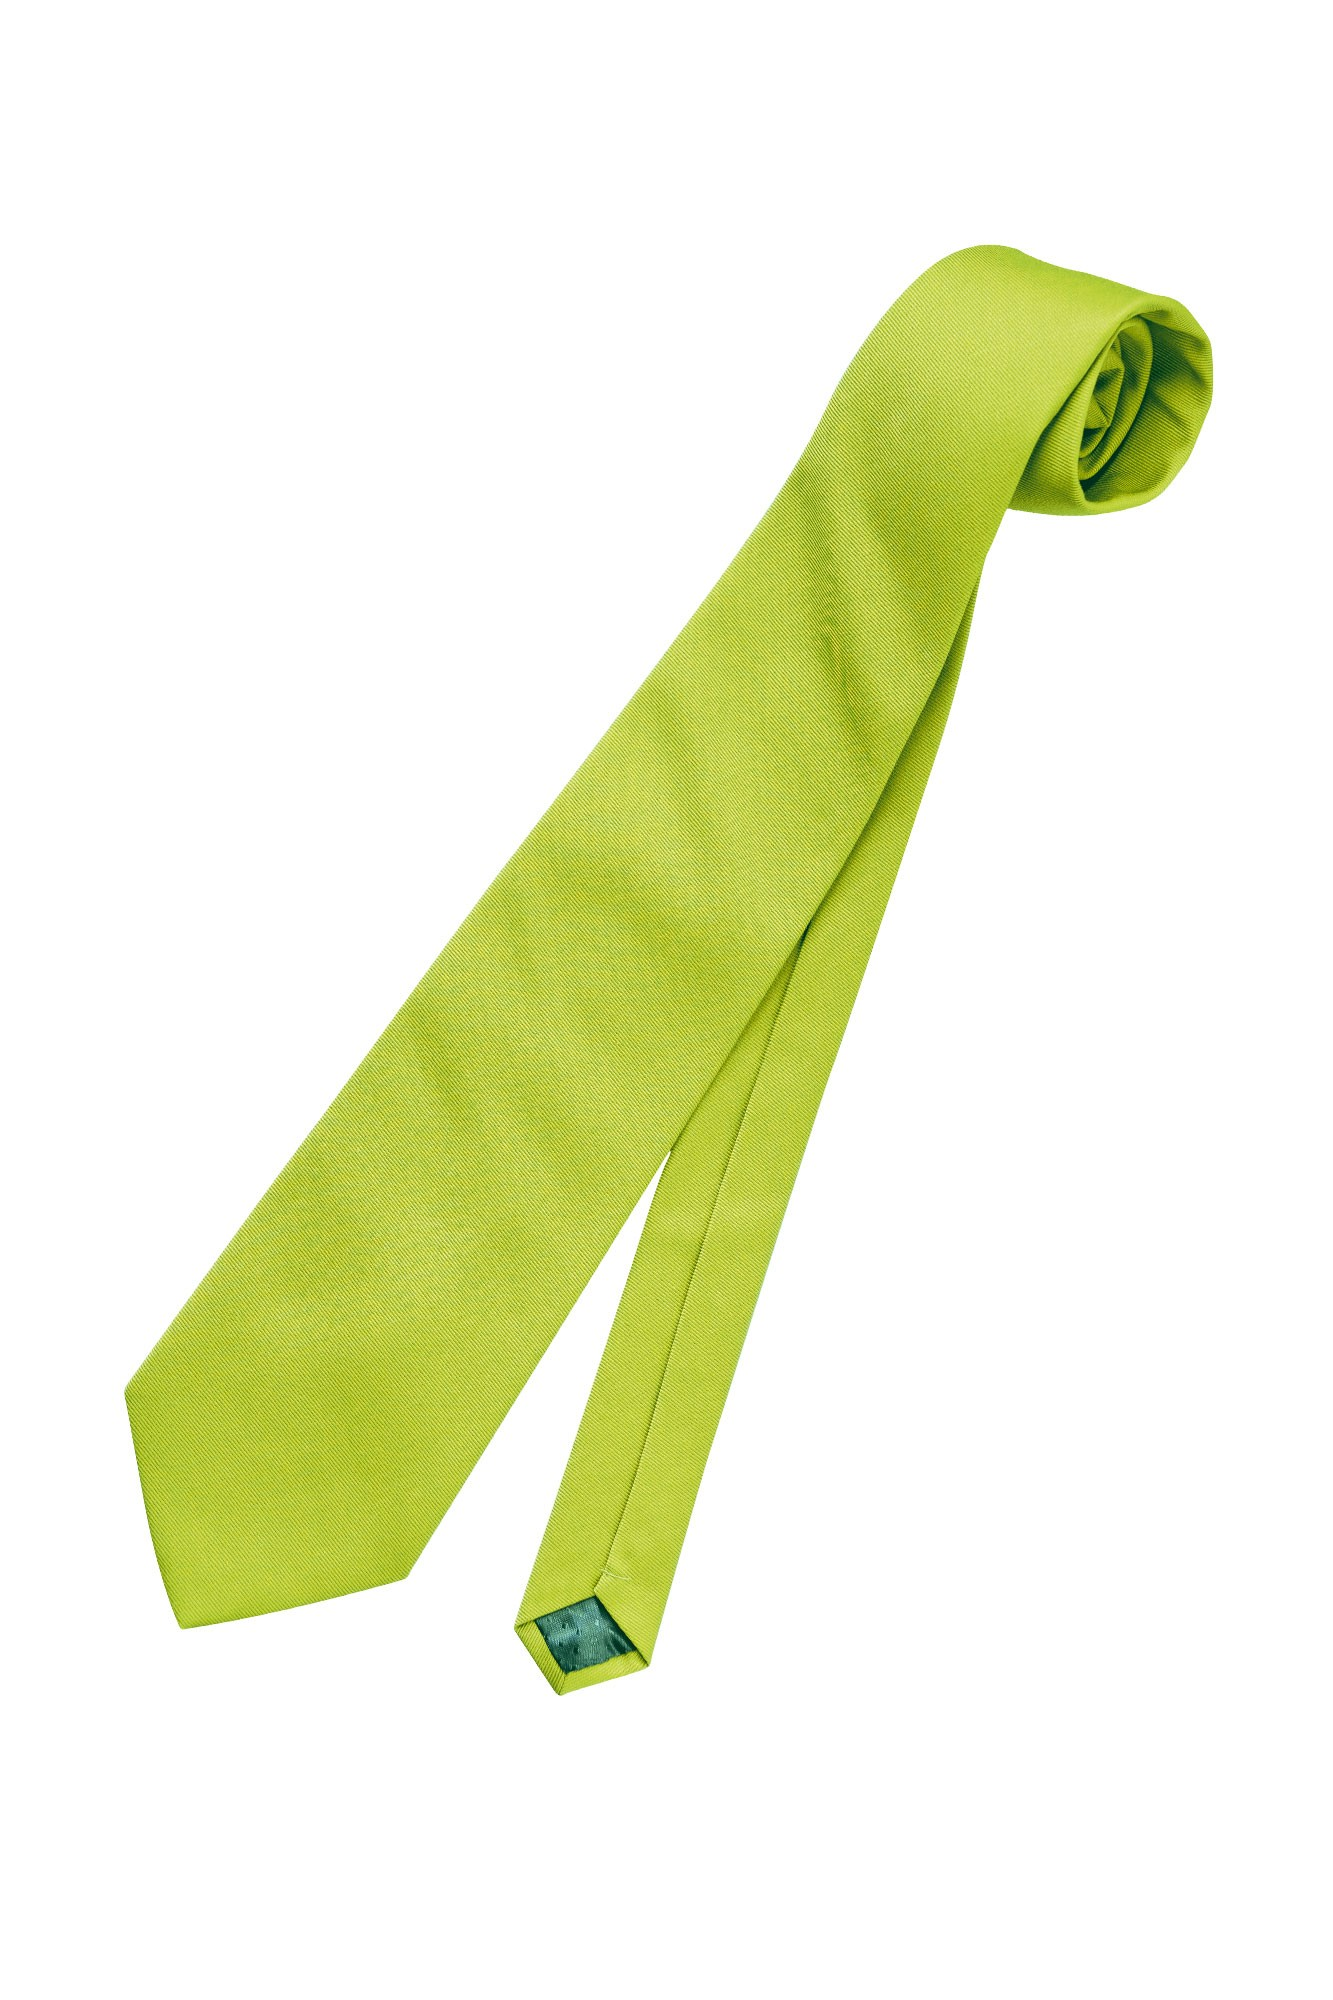 Kravata Bo - zelené jablko